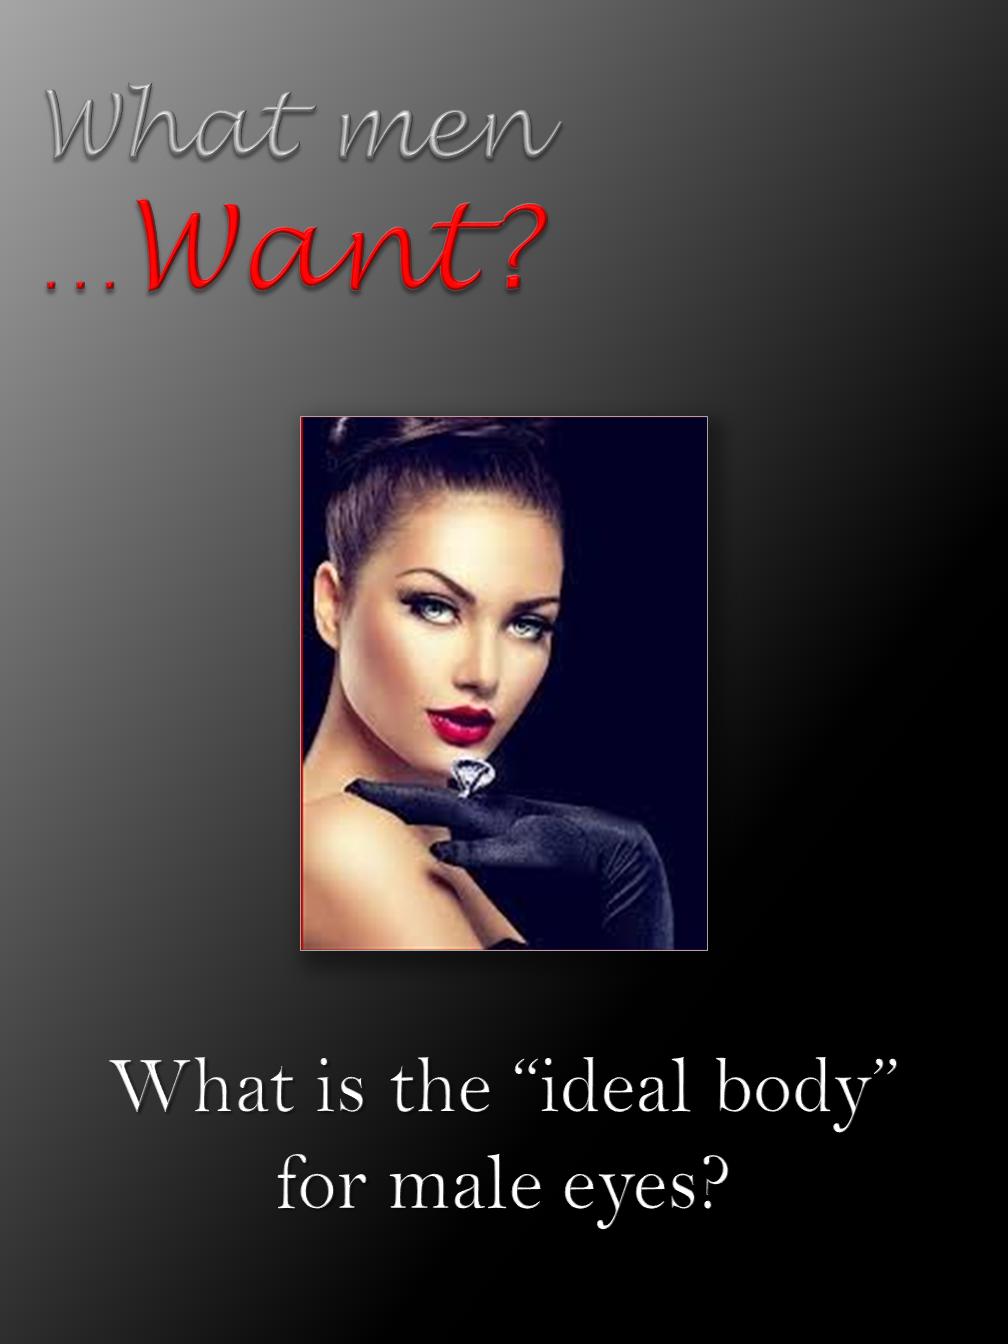 What men want?